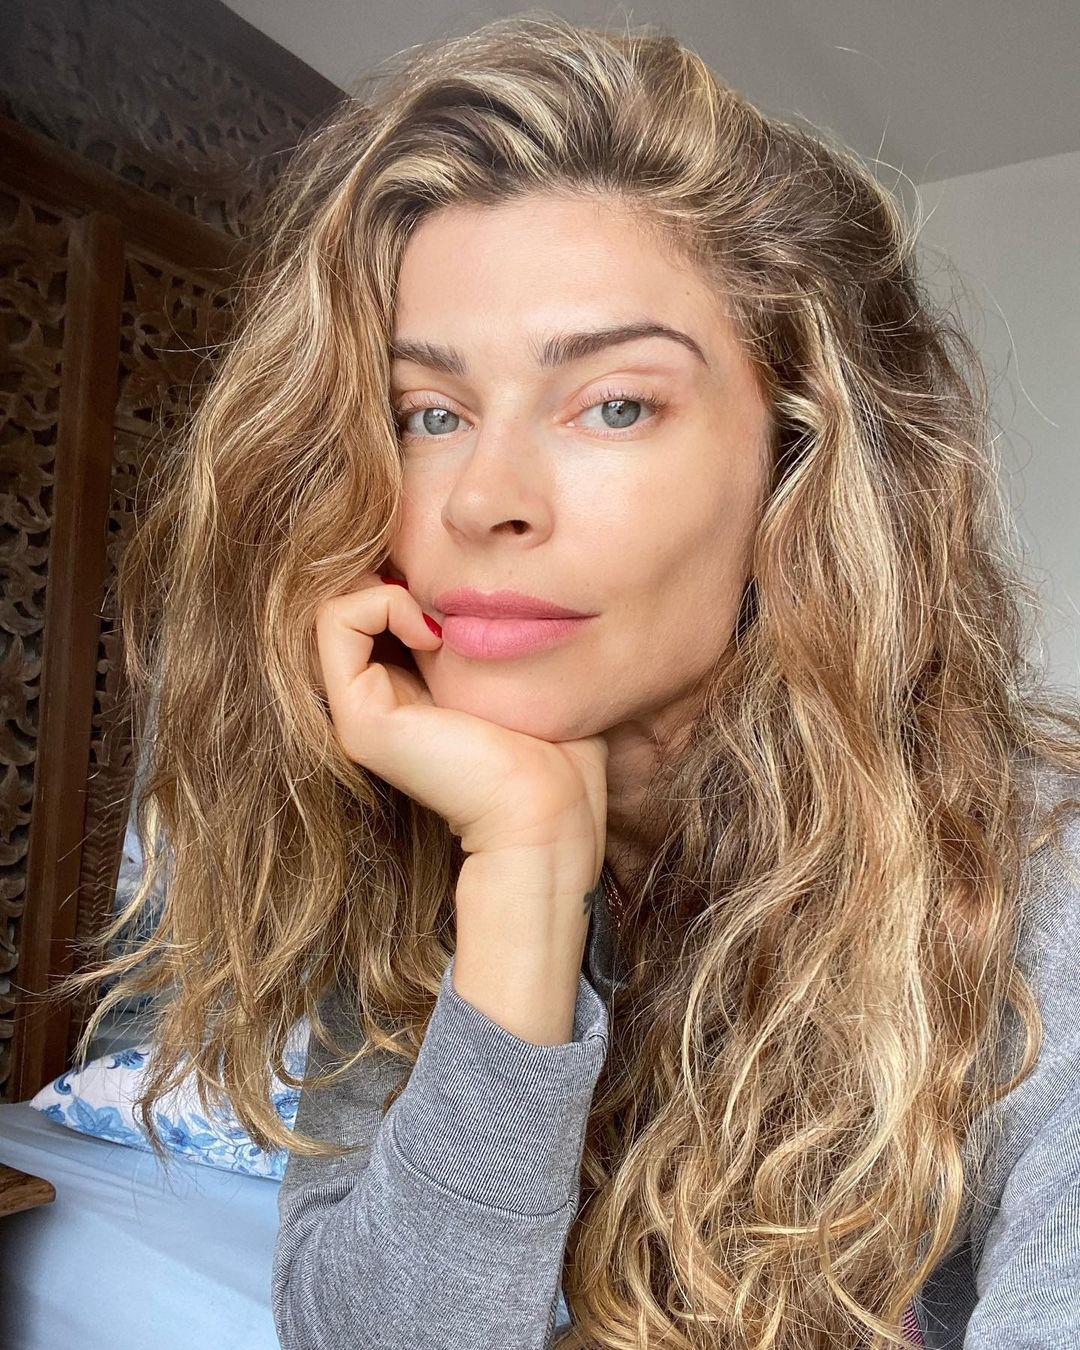 Imagem mostra rosto e cabelos da Grazi Massafera